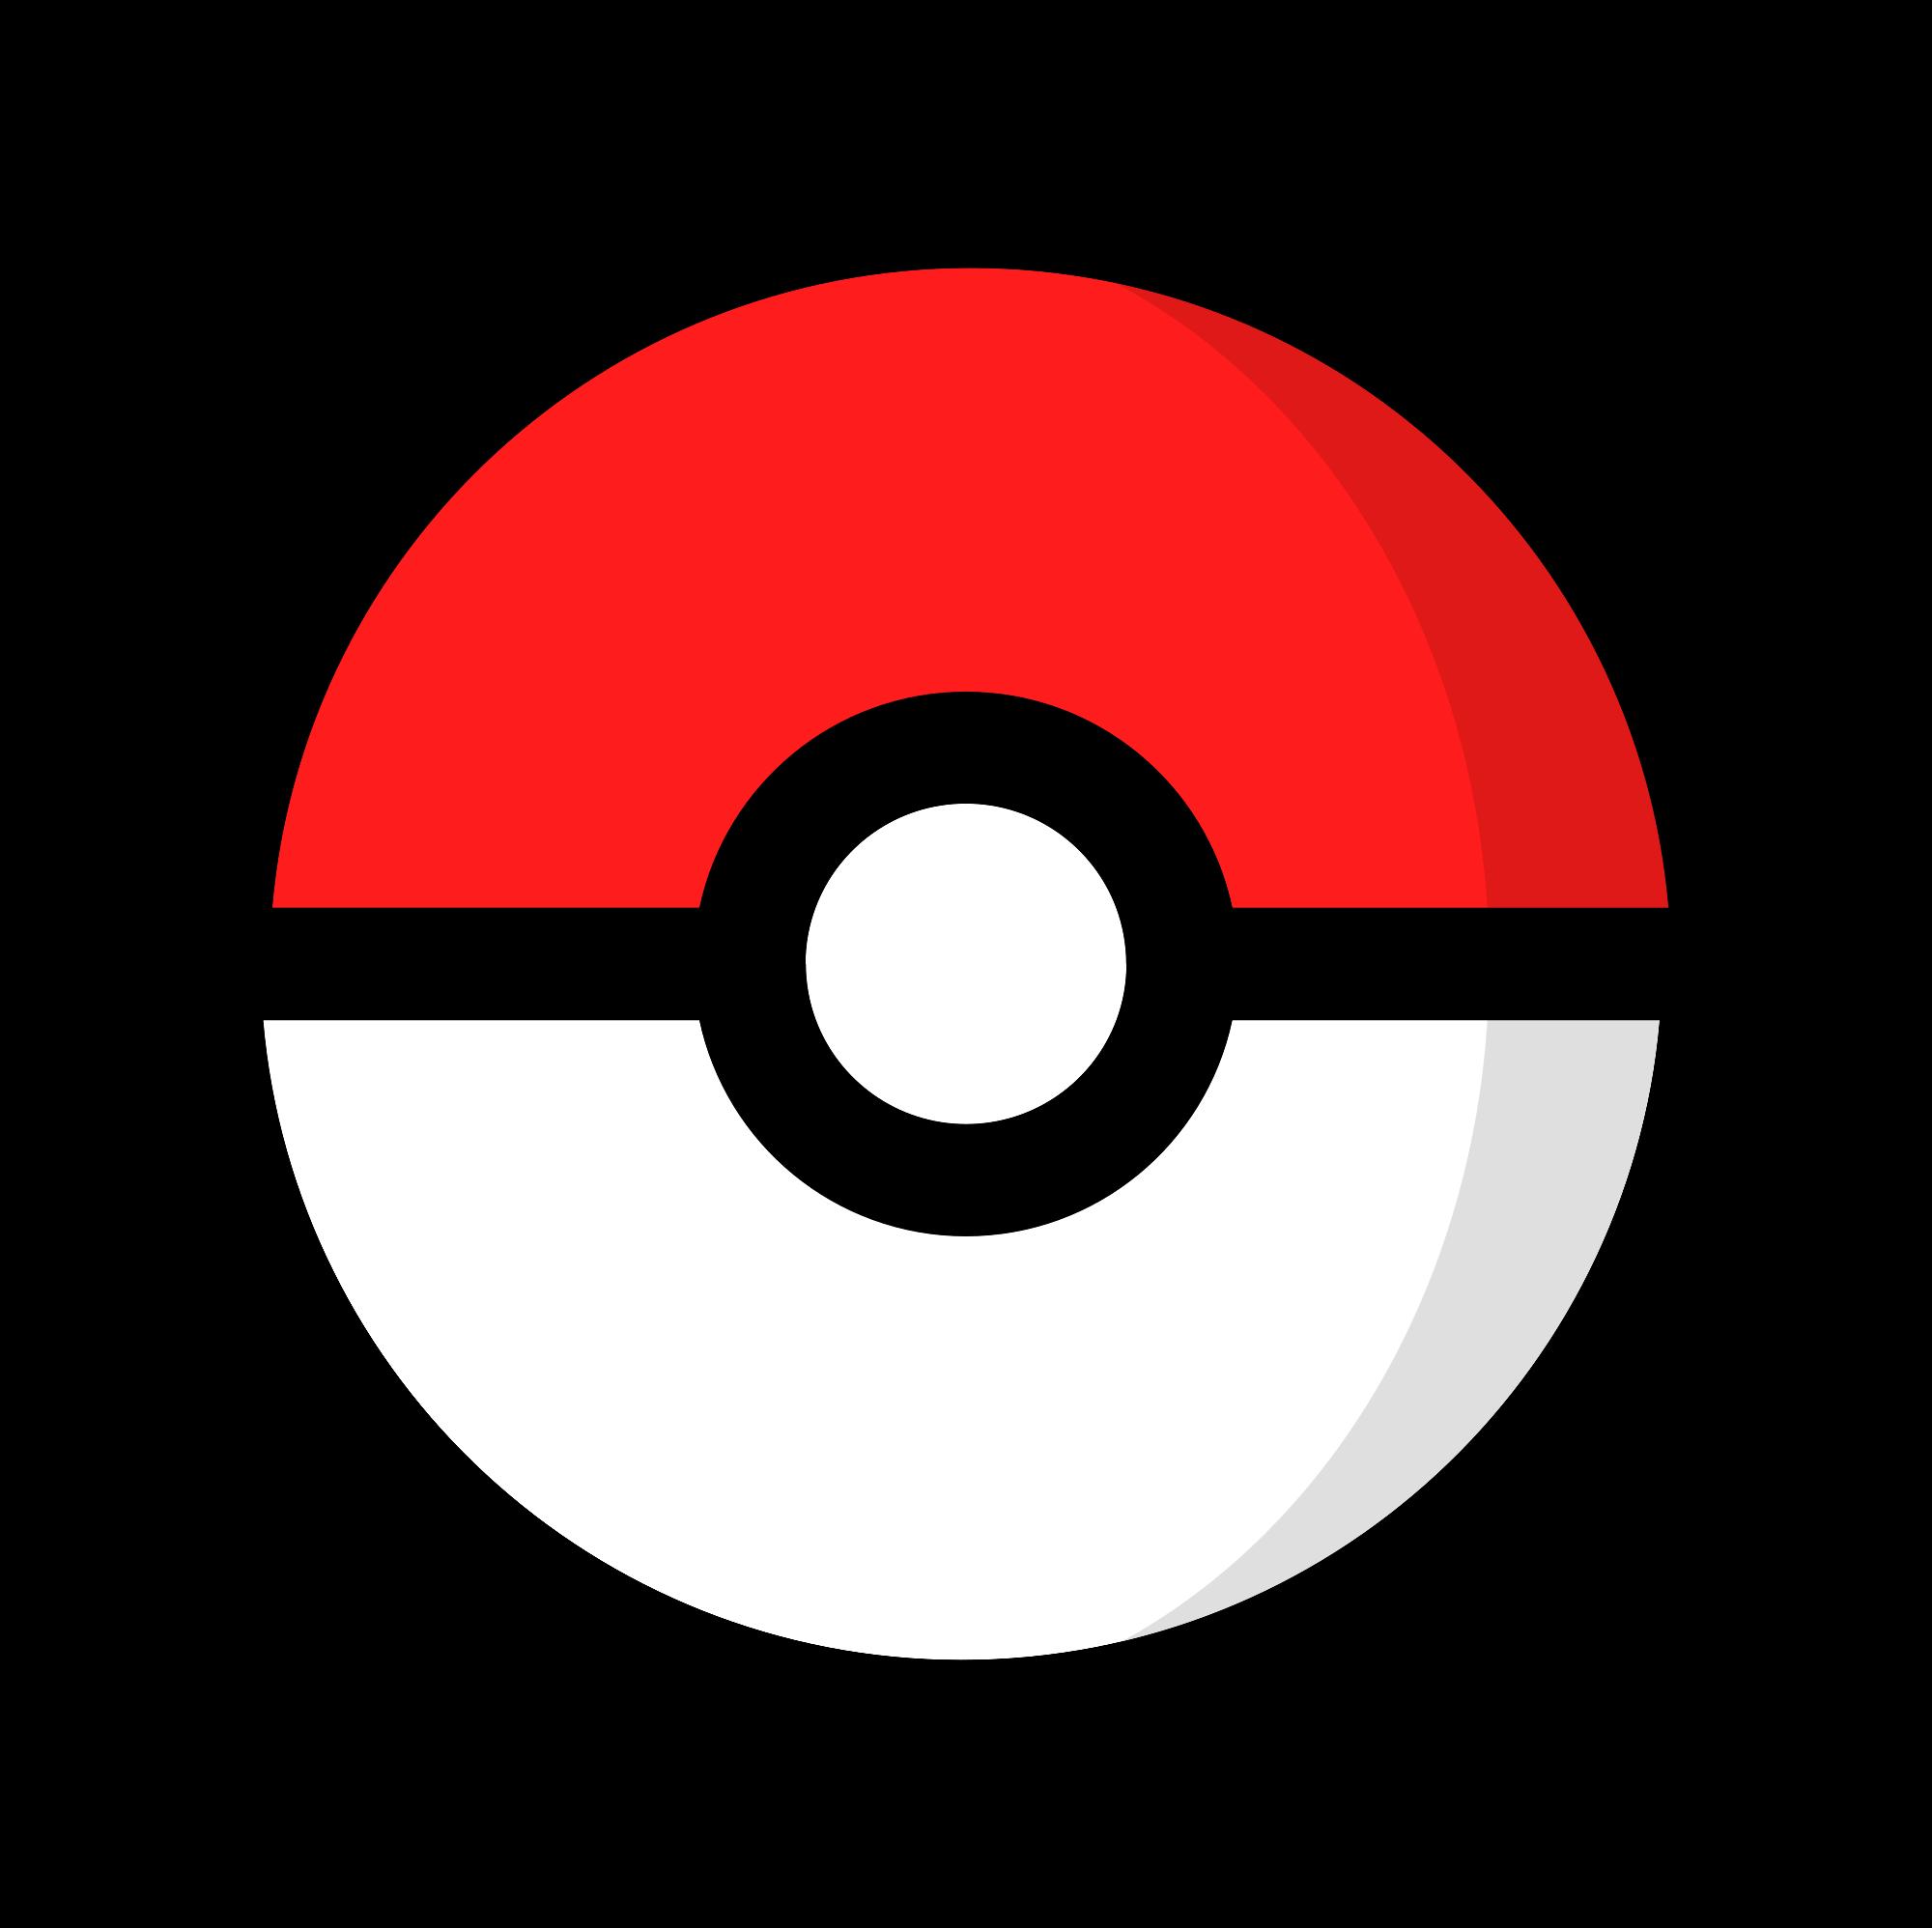 image Pokeball clipart avatar. File pok ball icon